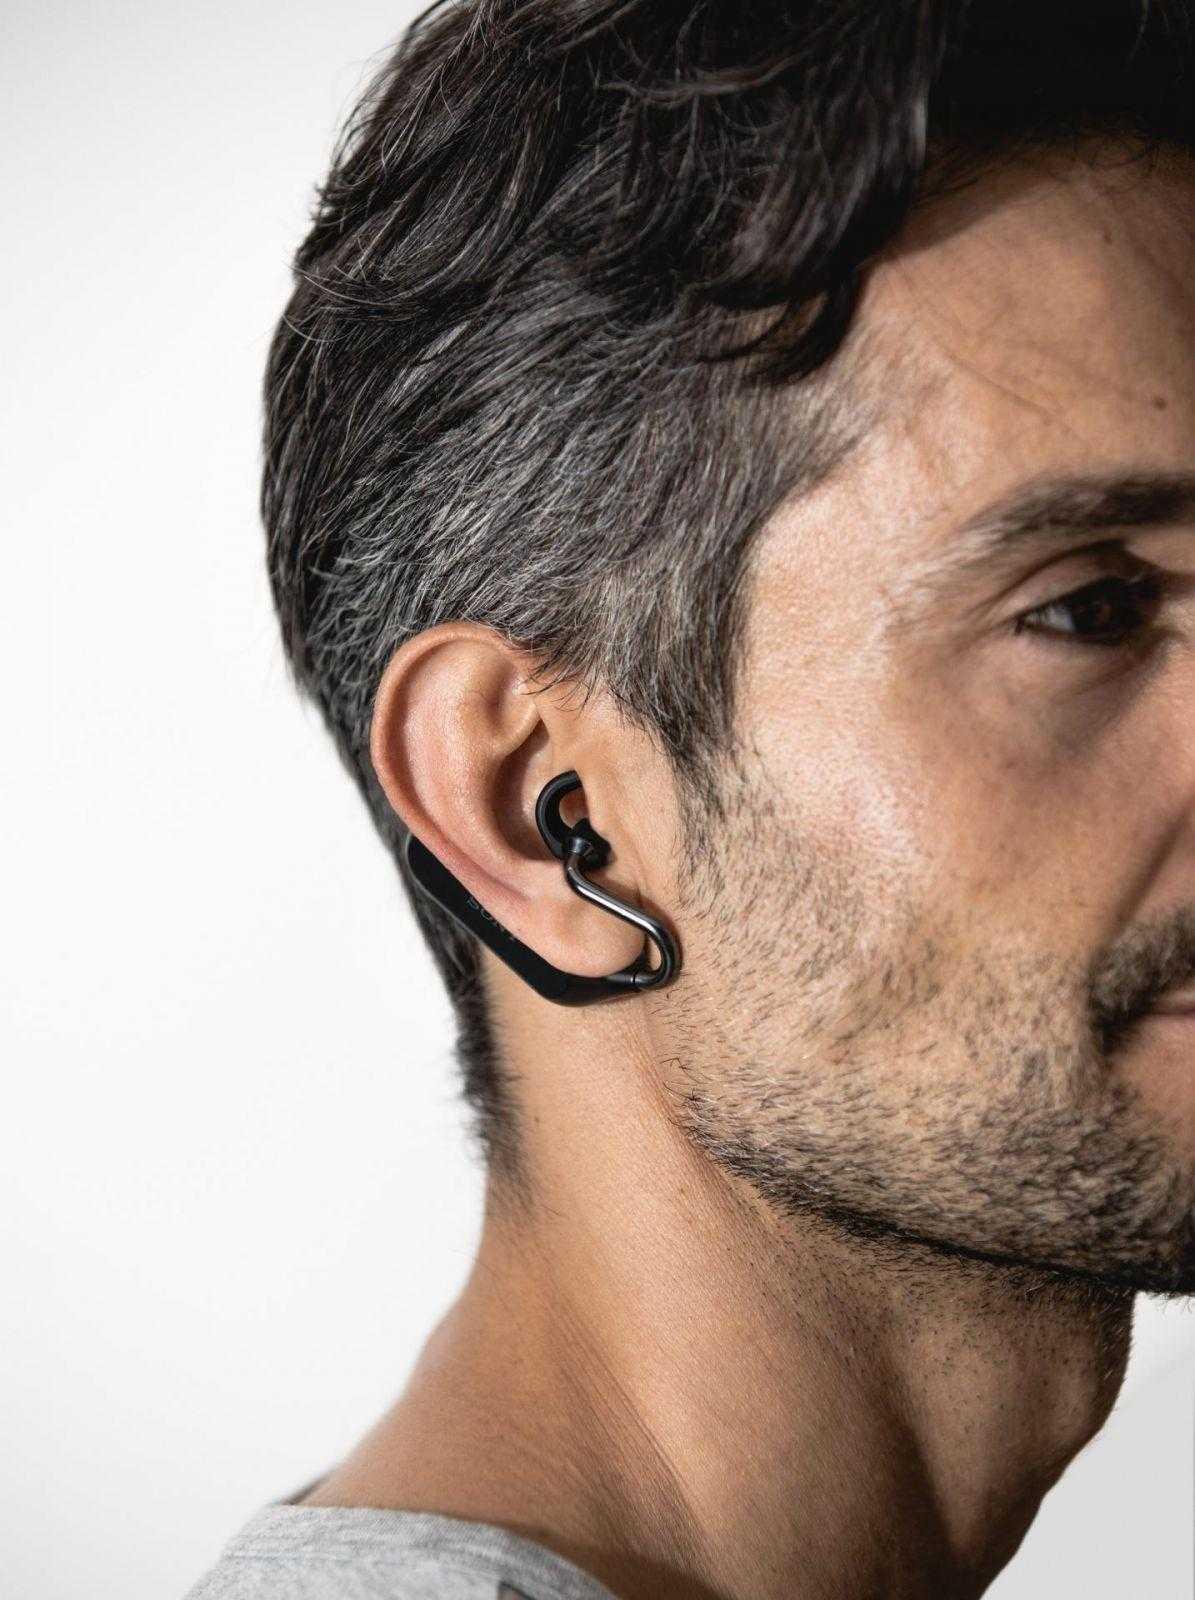 MWC 2018. Sony выпустила наушники Xperia Ear Duo MWC 2018. Sony выпустила наушники Xperia Ear Duo